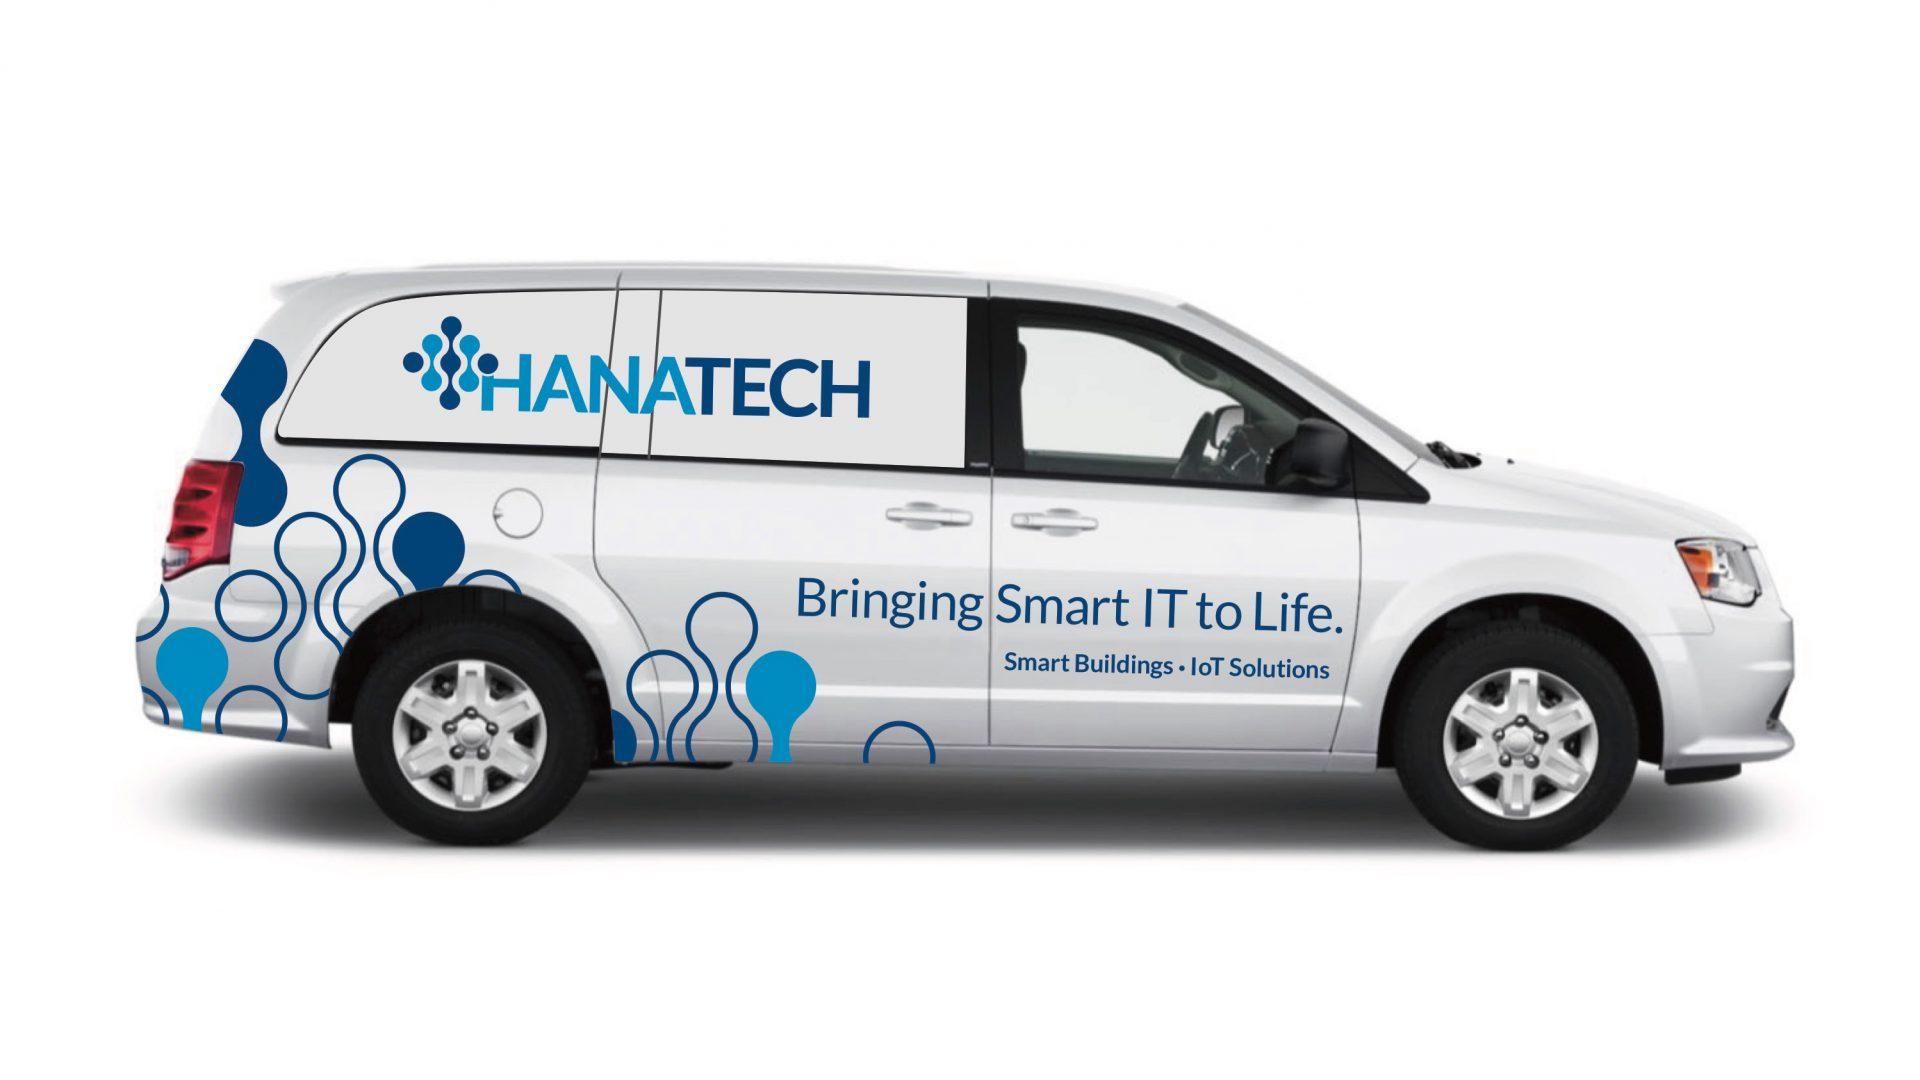 Hanatech car